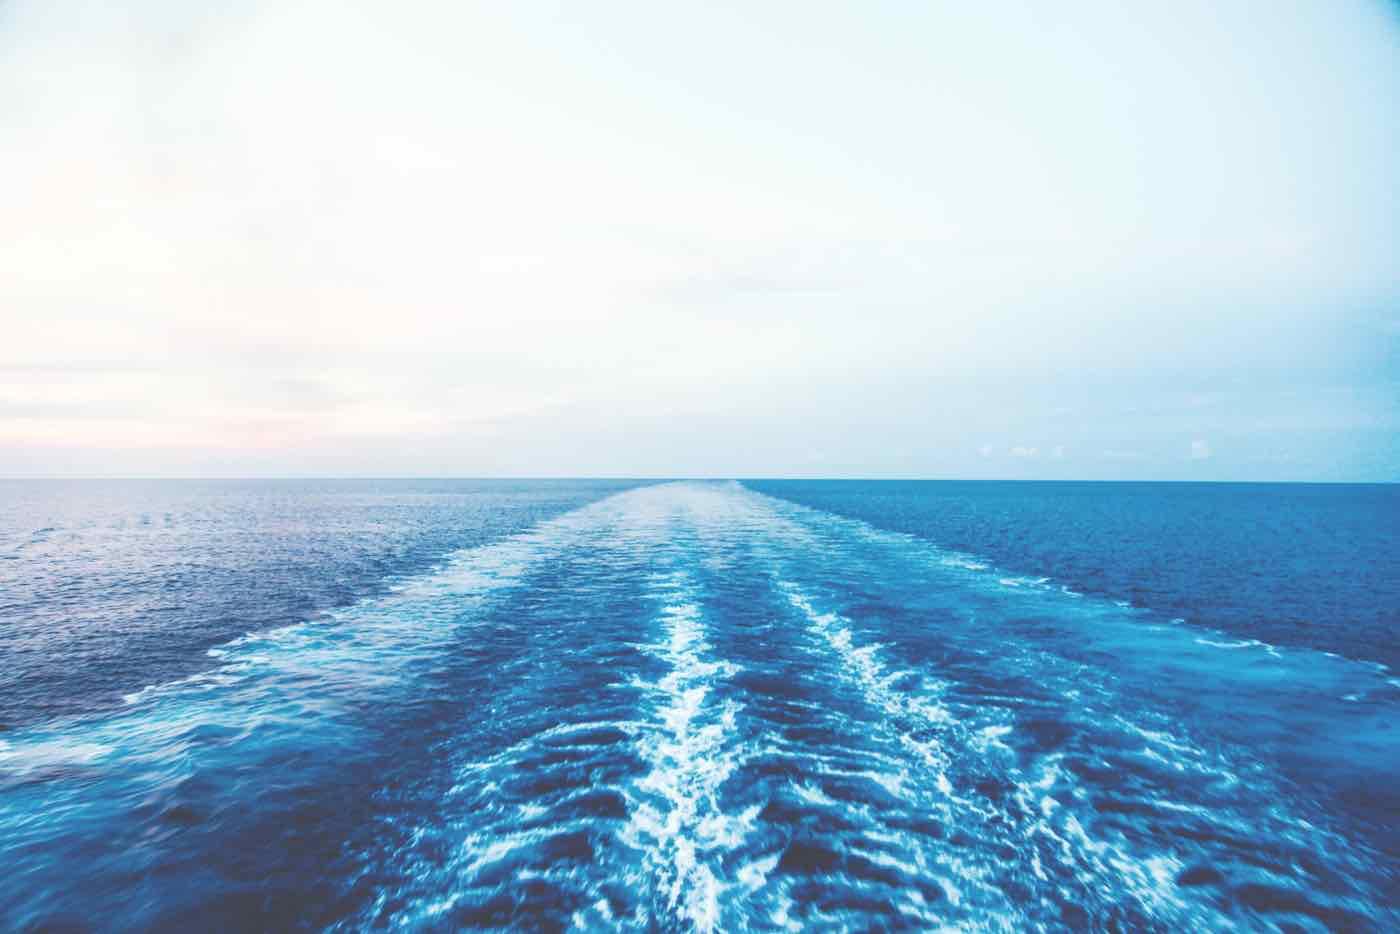 Cruise ship pollution water ocean